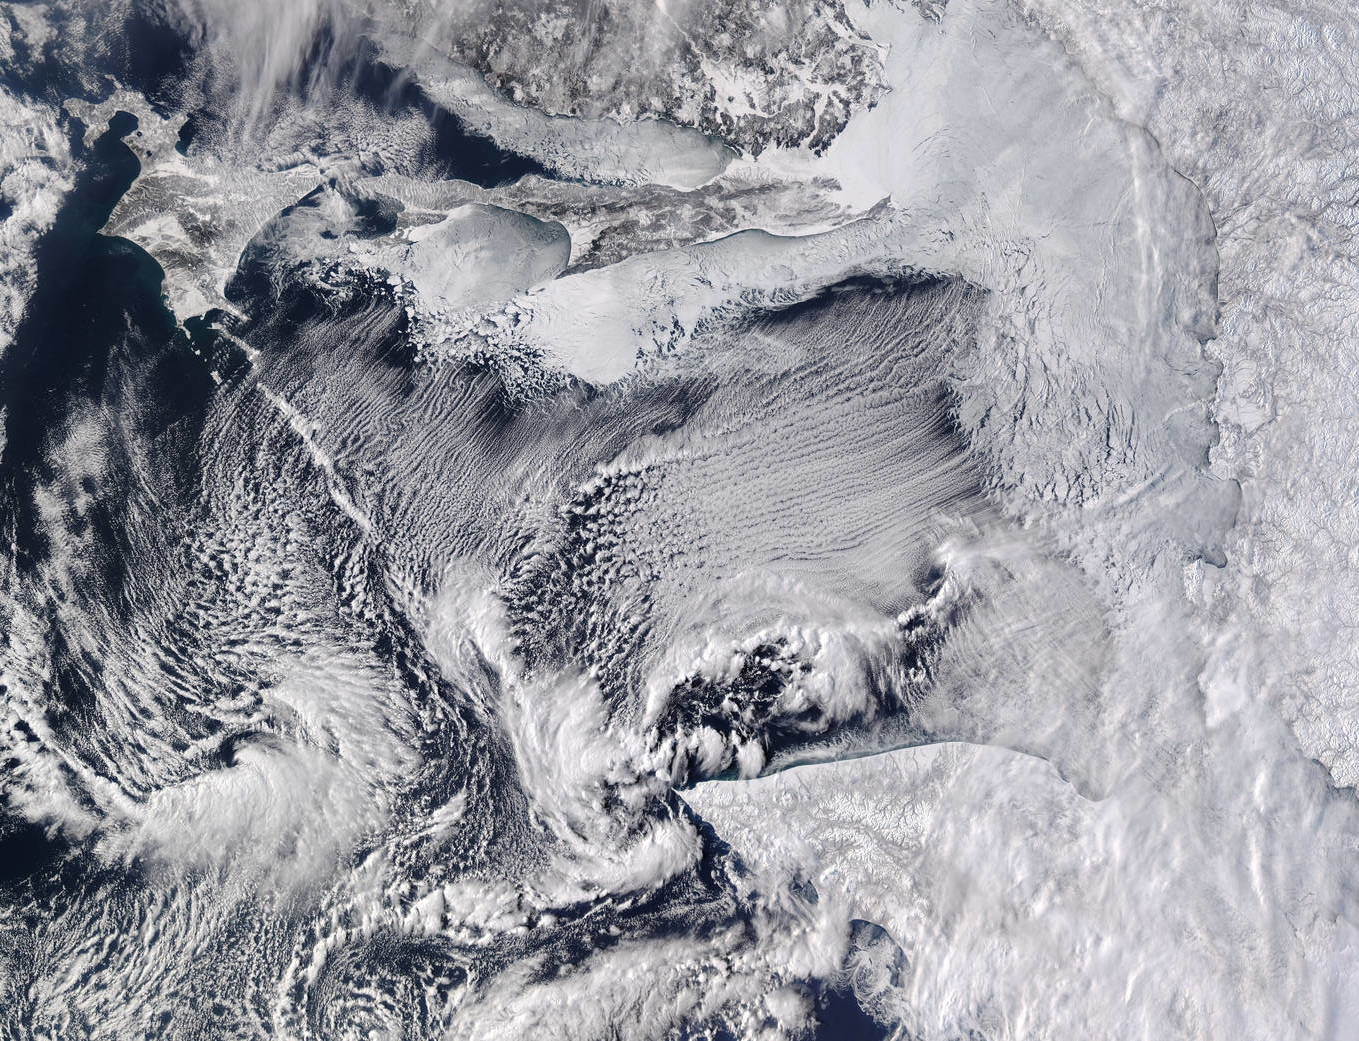 seaofokhotsk.a2016039.0305.250m.jpg